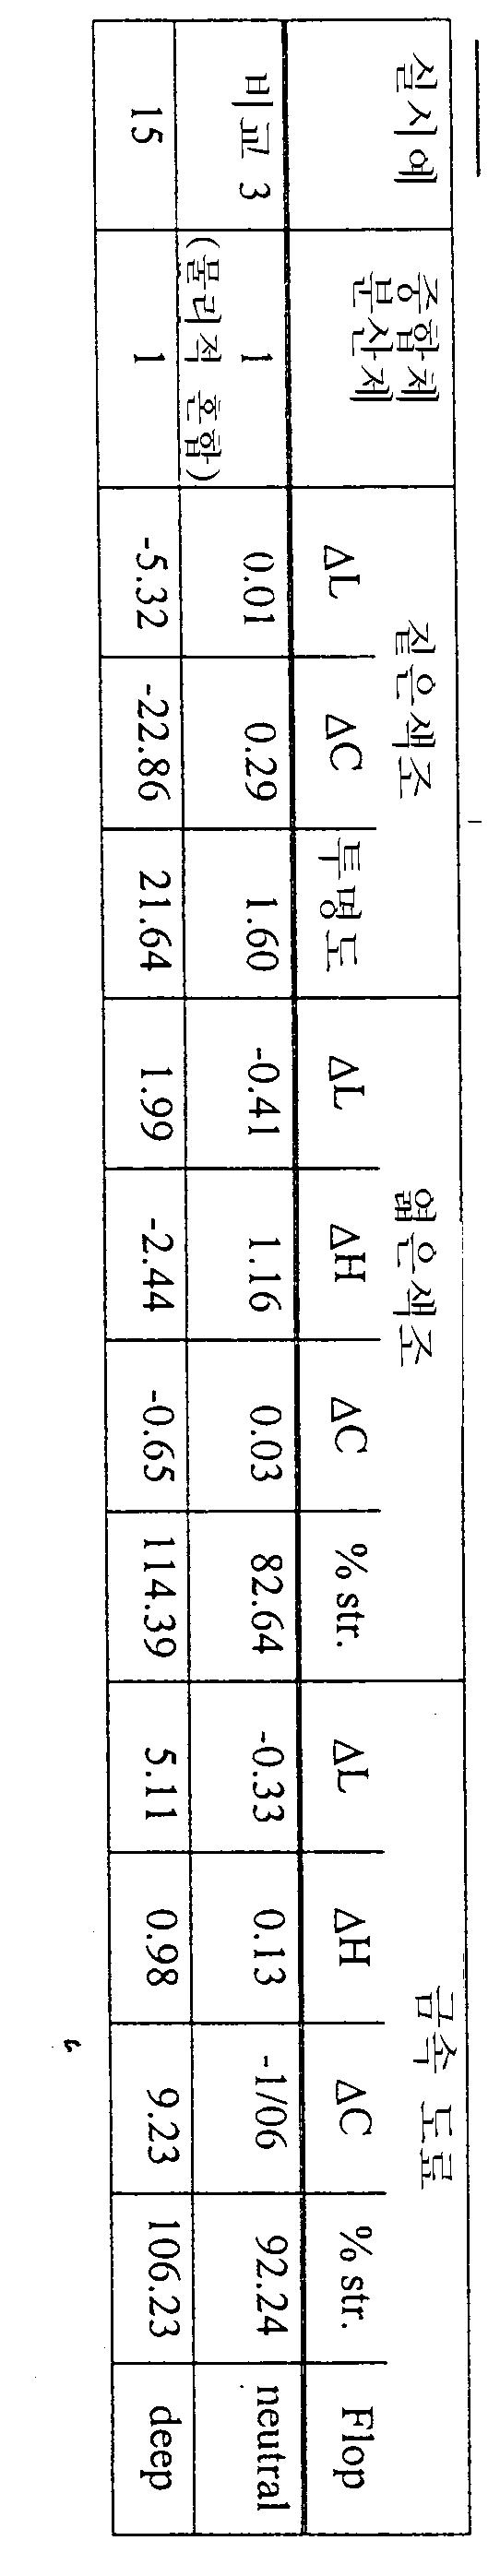 Figure 112000024511186-pat00003